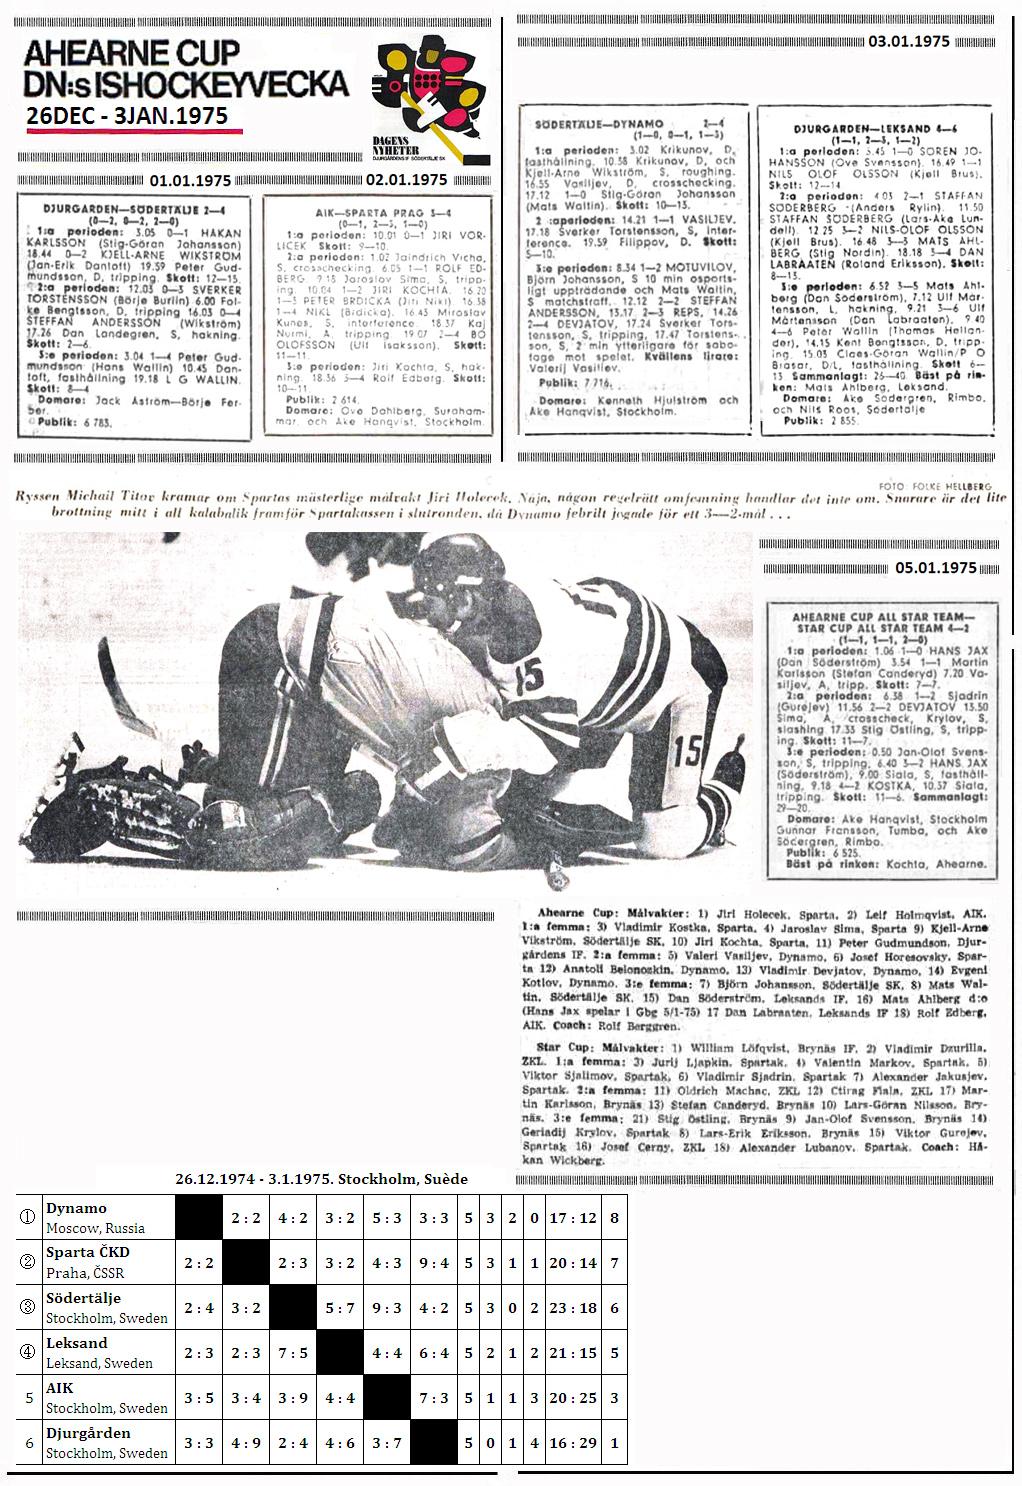 Ahearne Cup 1975.1.jpg